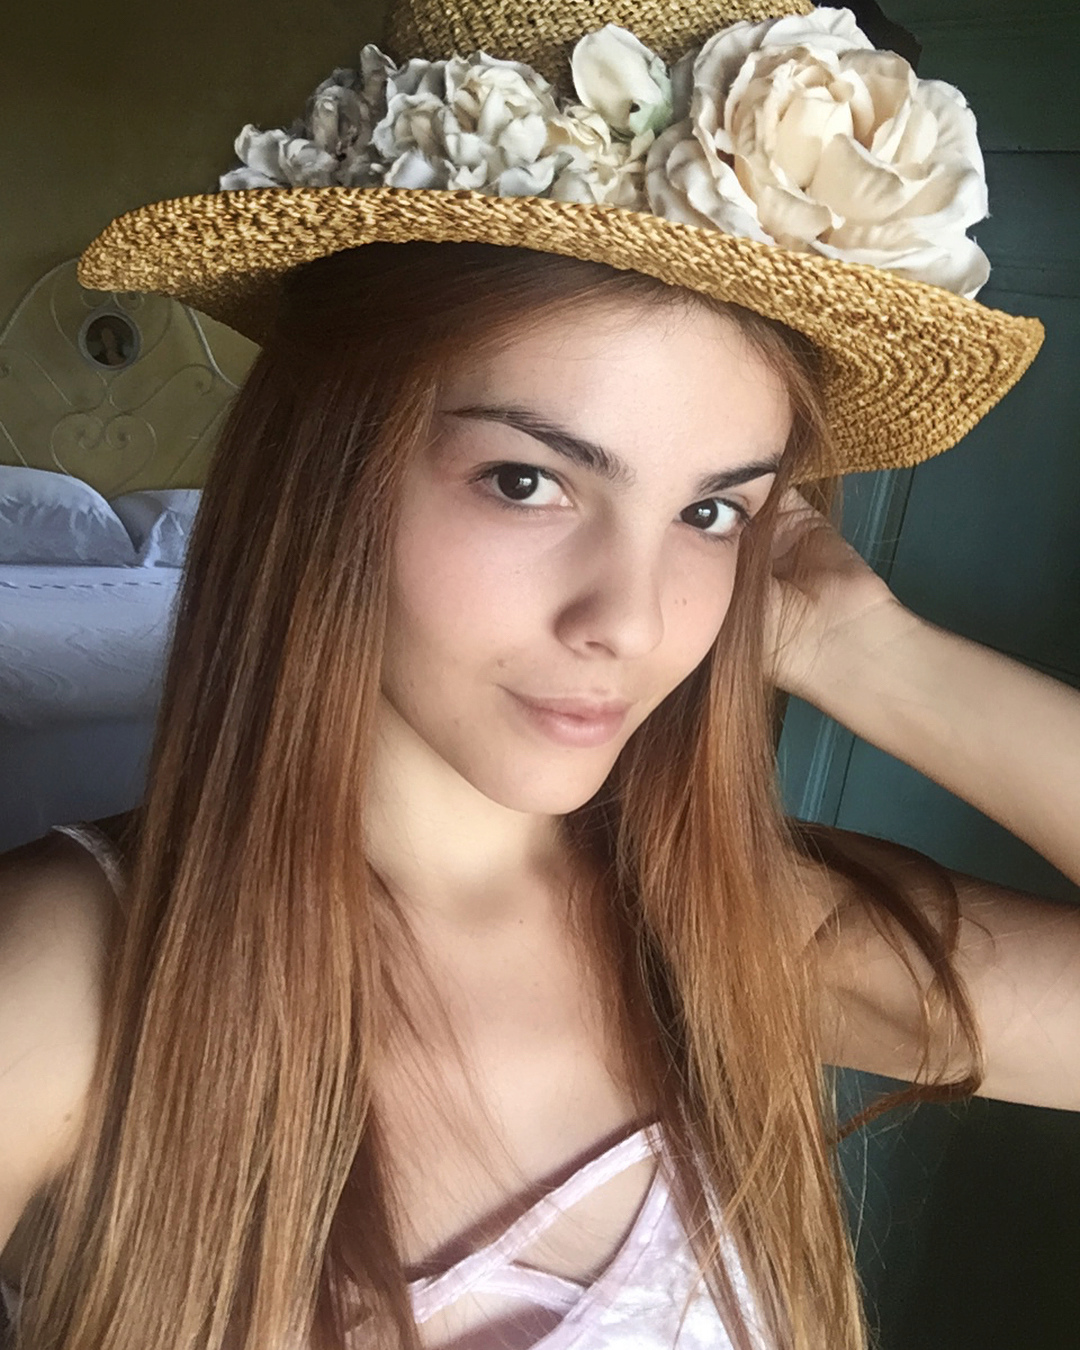 nathalie de oliveira, miss bom jardim 2019/1st runner-up de miss international queen 2016. - Página 3 38017910